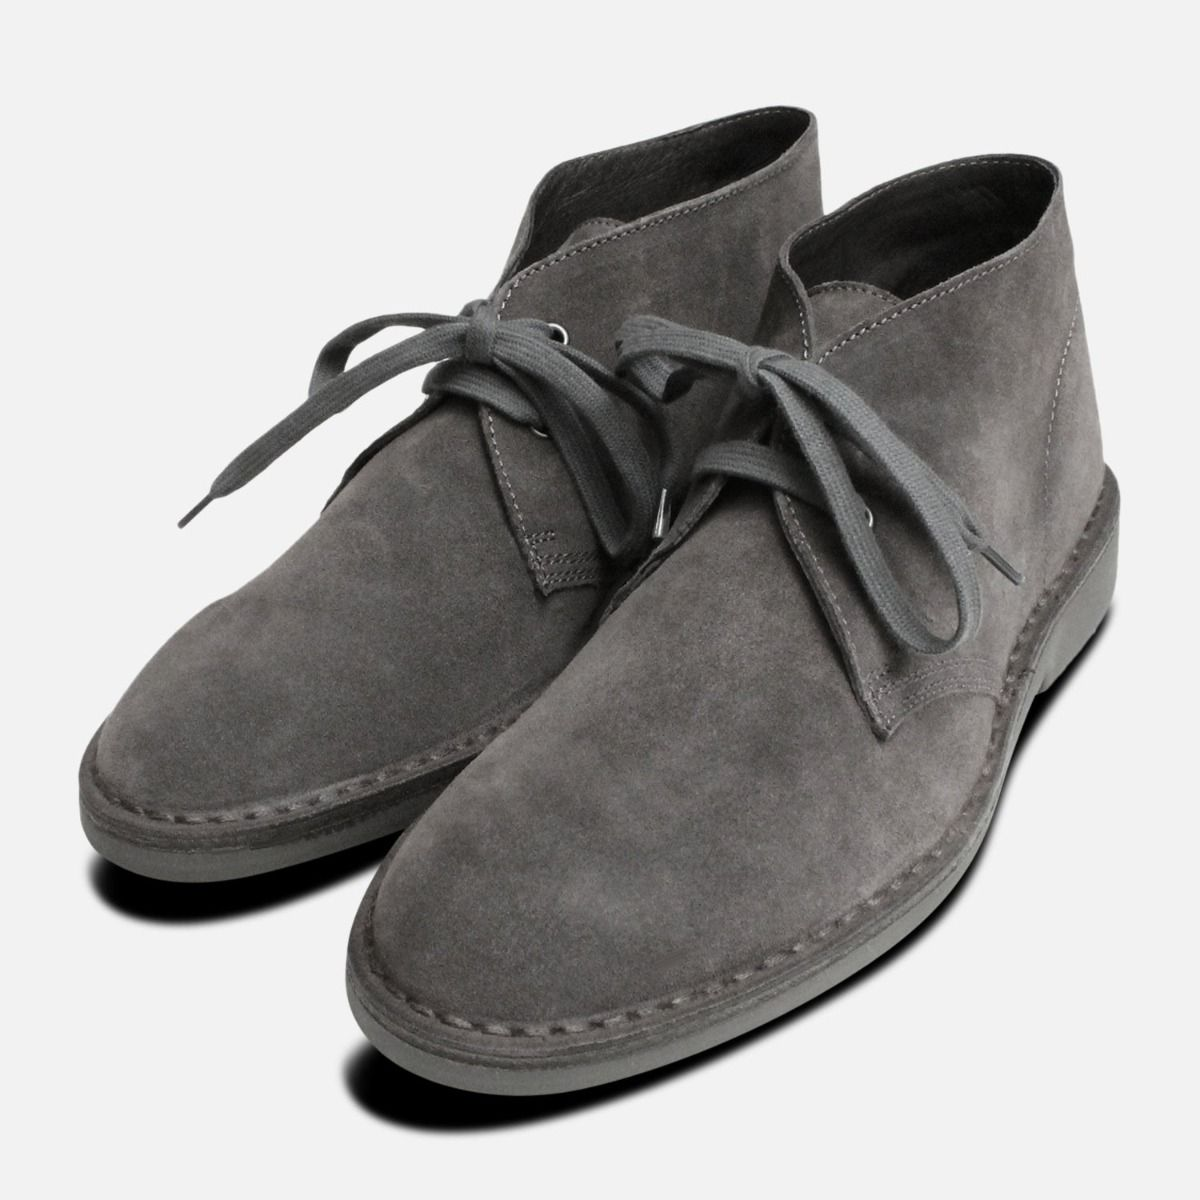 Dark Grey Suede Italian Mens Desert Boots a1de7de84